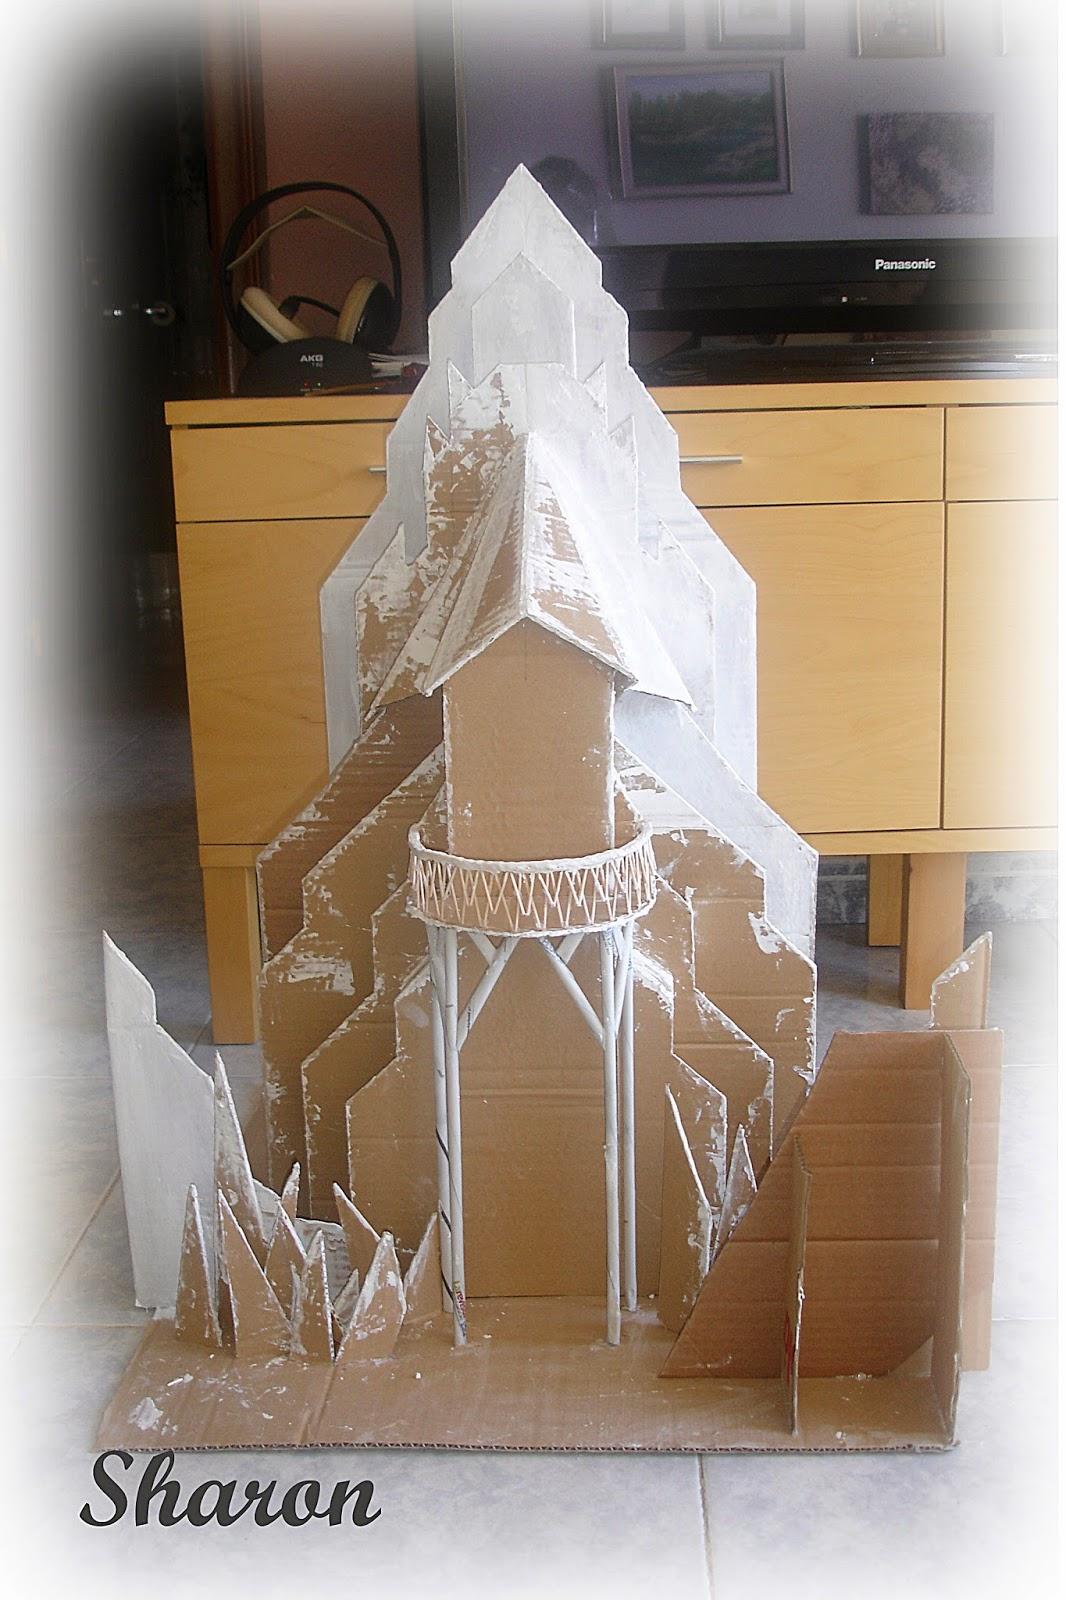 Castillos de carton - 3 part 10